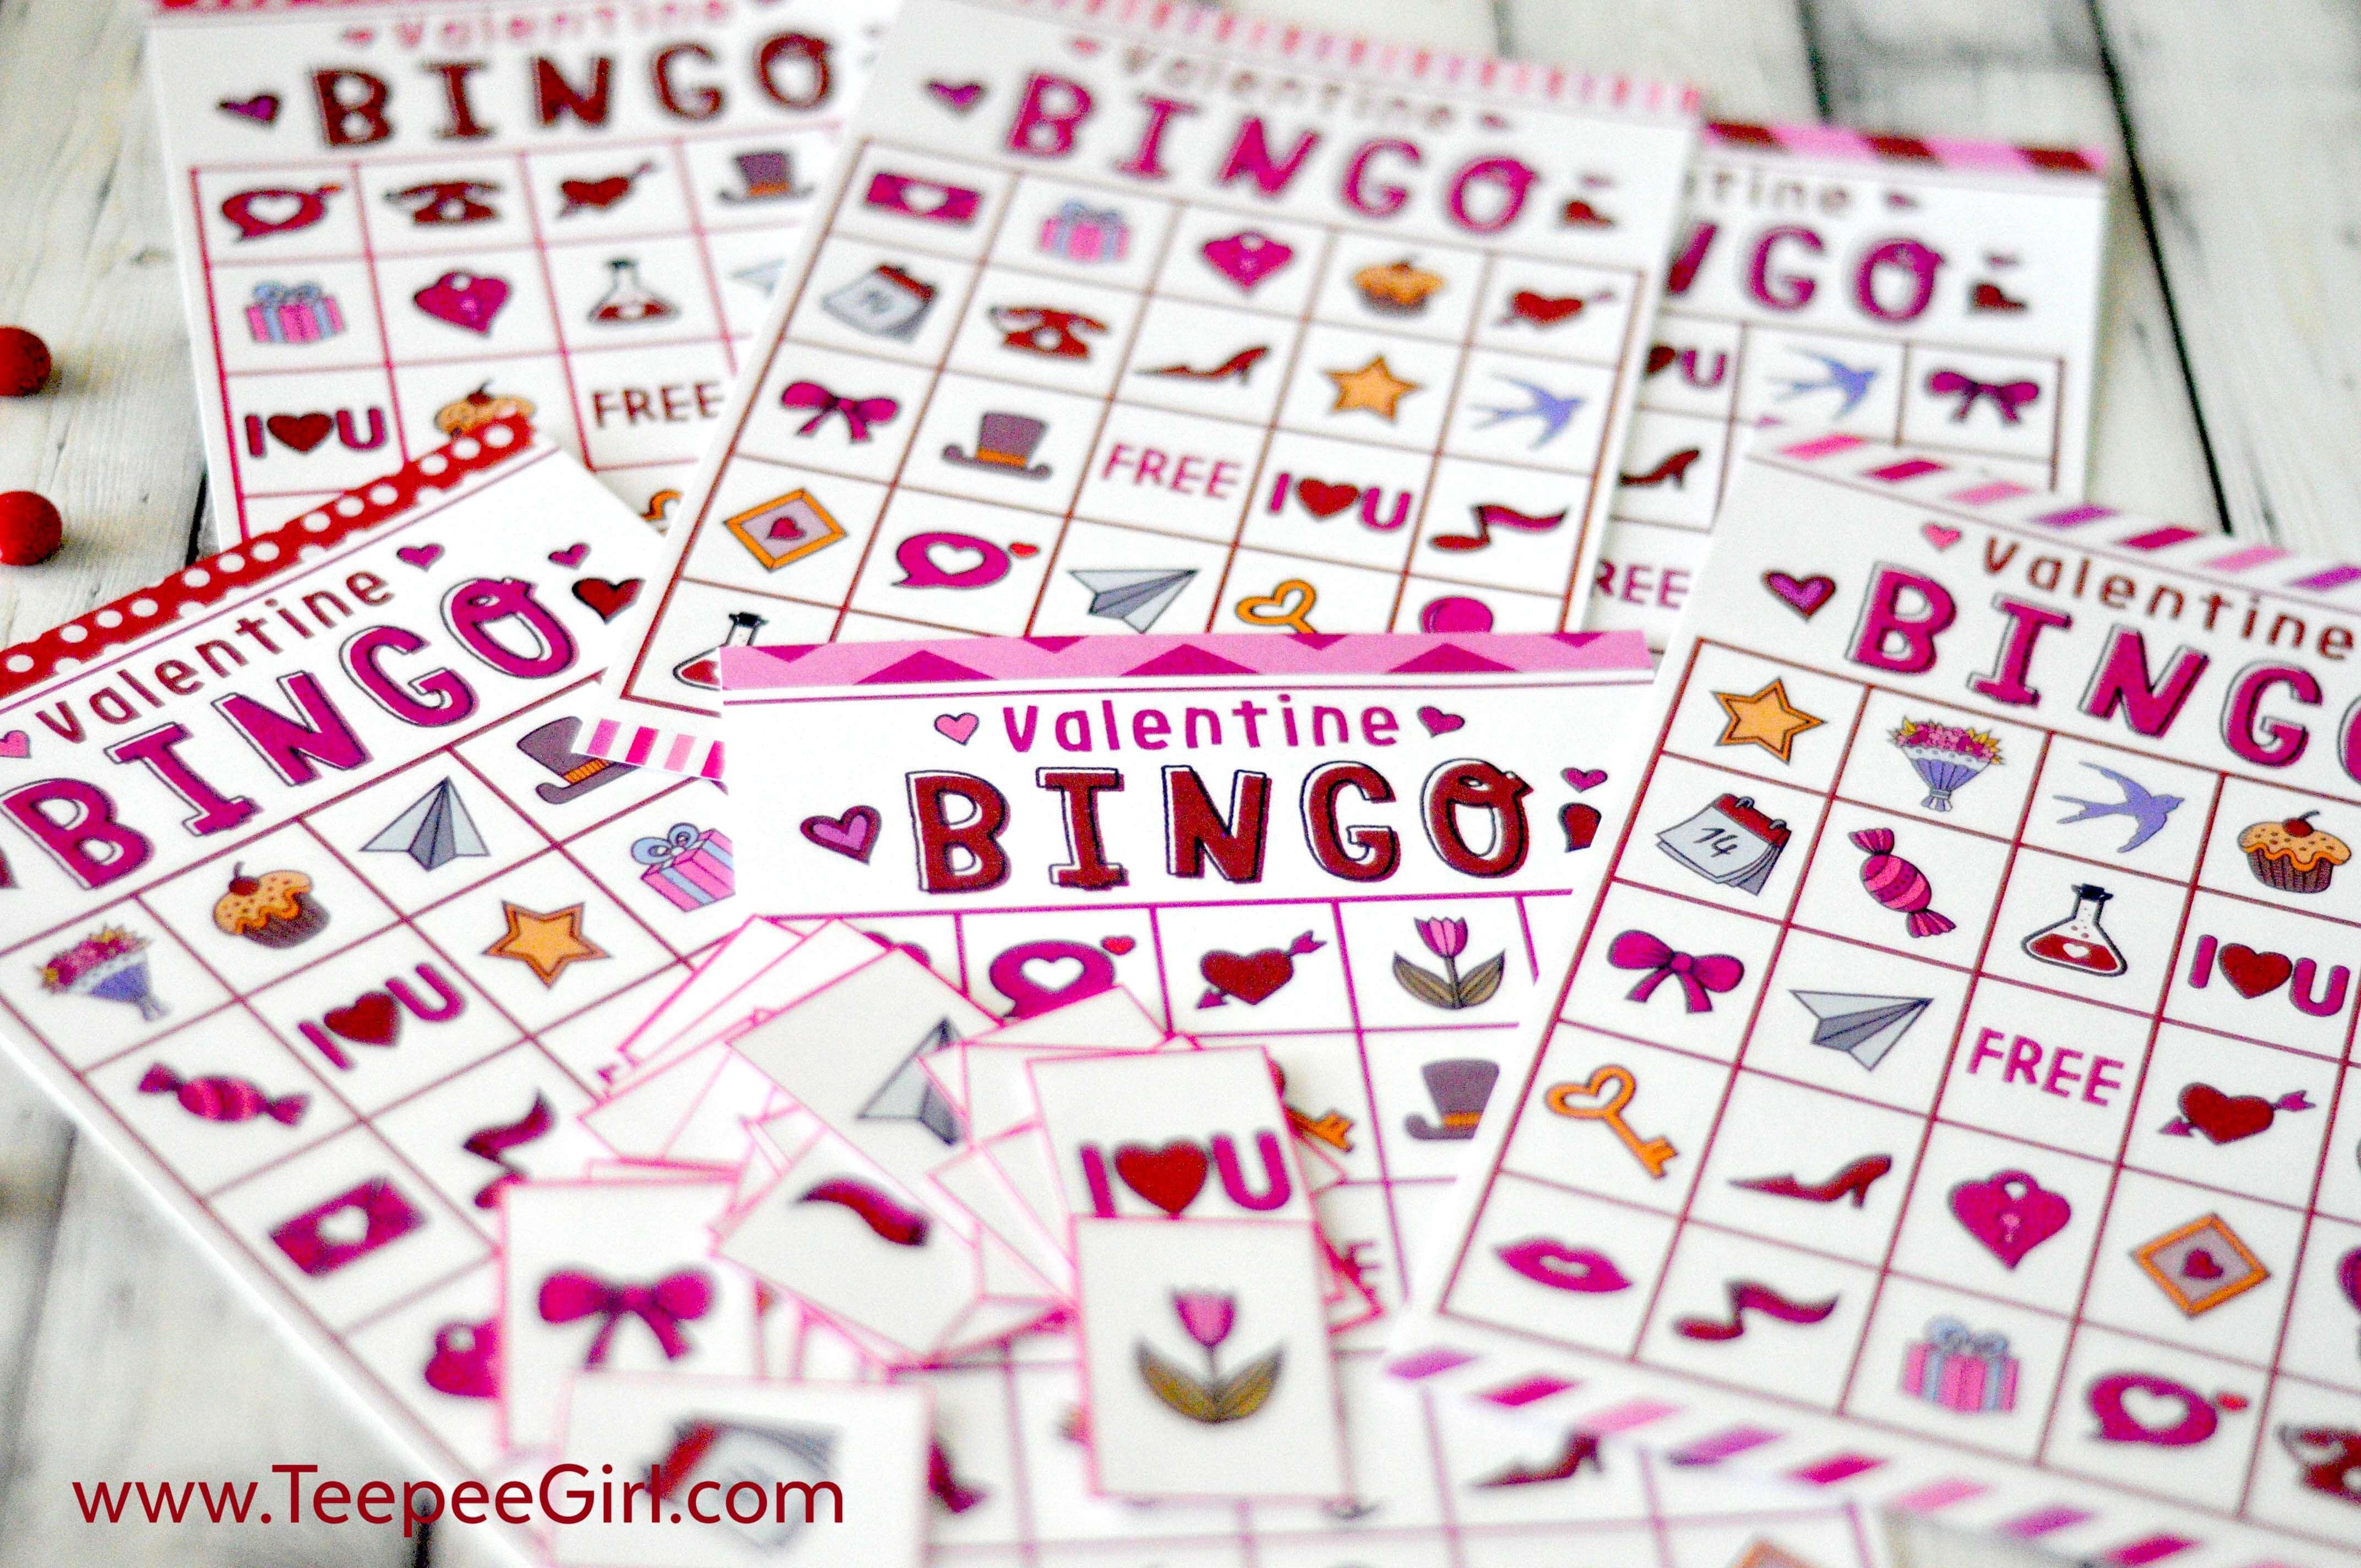 Free Valentines Day Printable Bingo Game - Free Printable Valentines Bingo